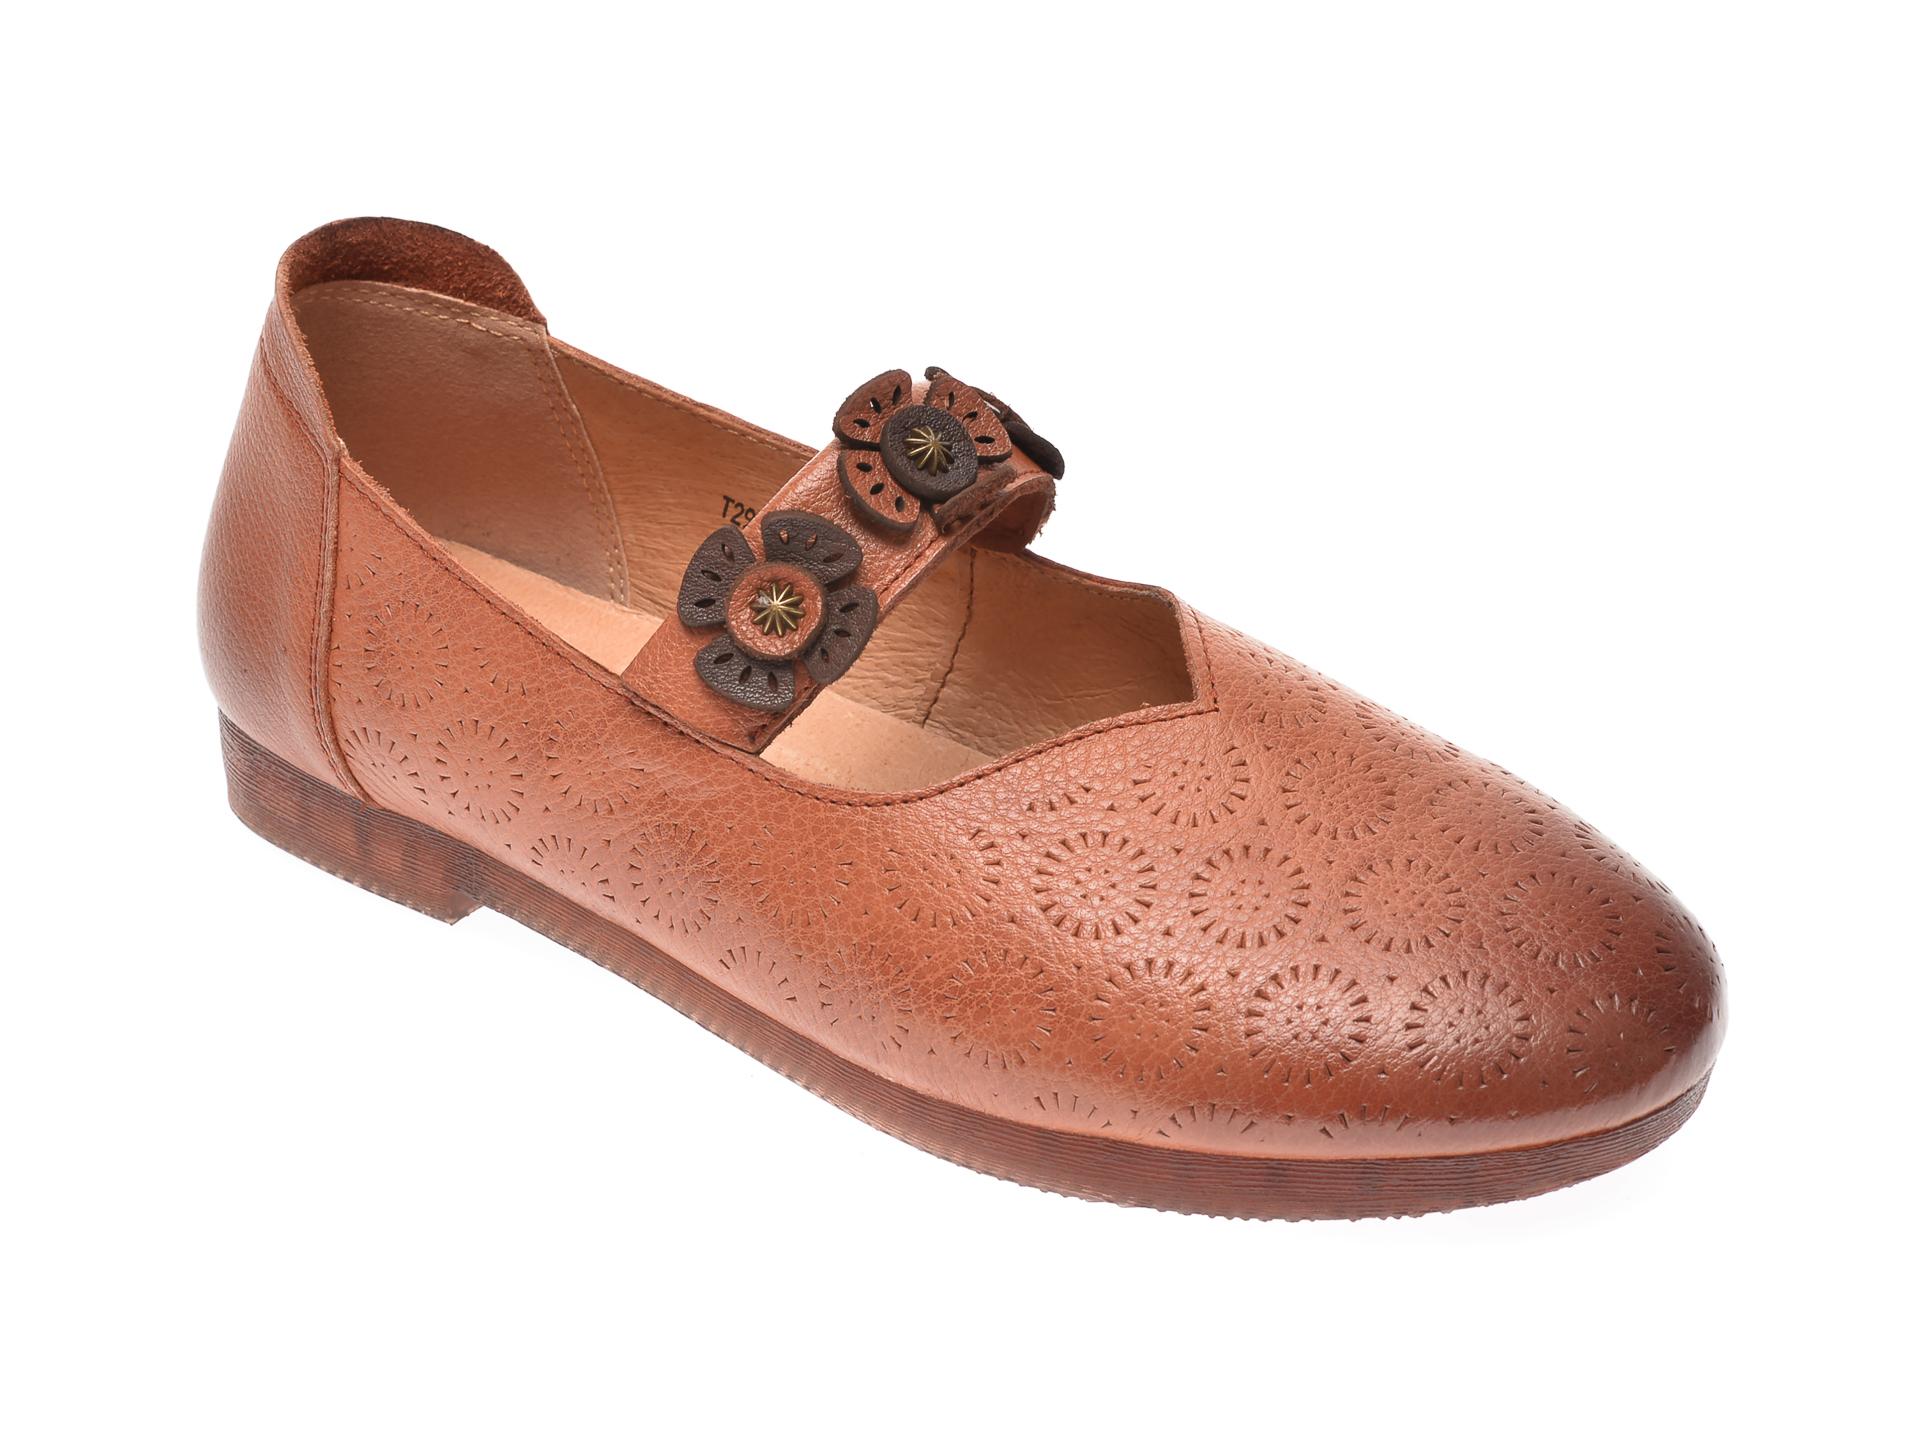 Pantofi PASS COLLECTION maro, T29113, din piele naturala imagine